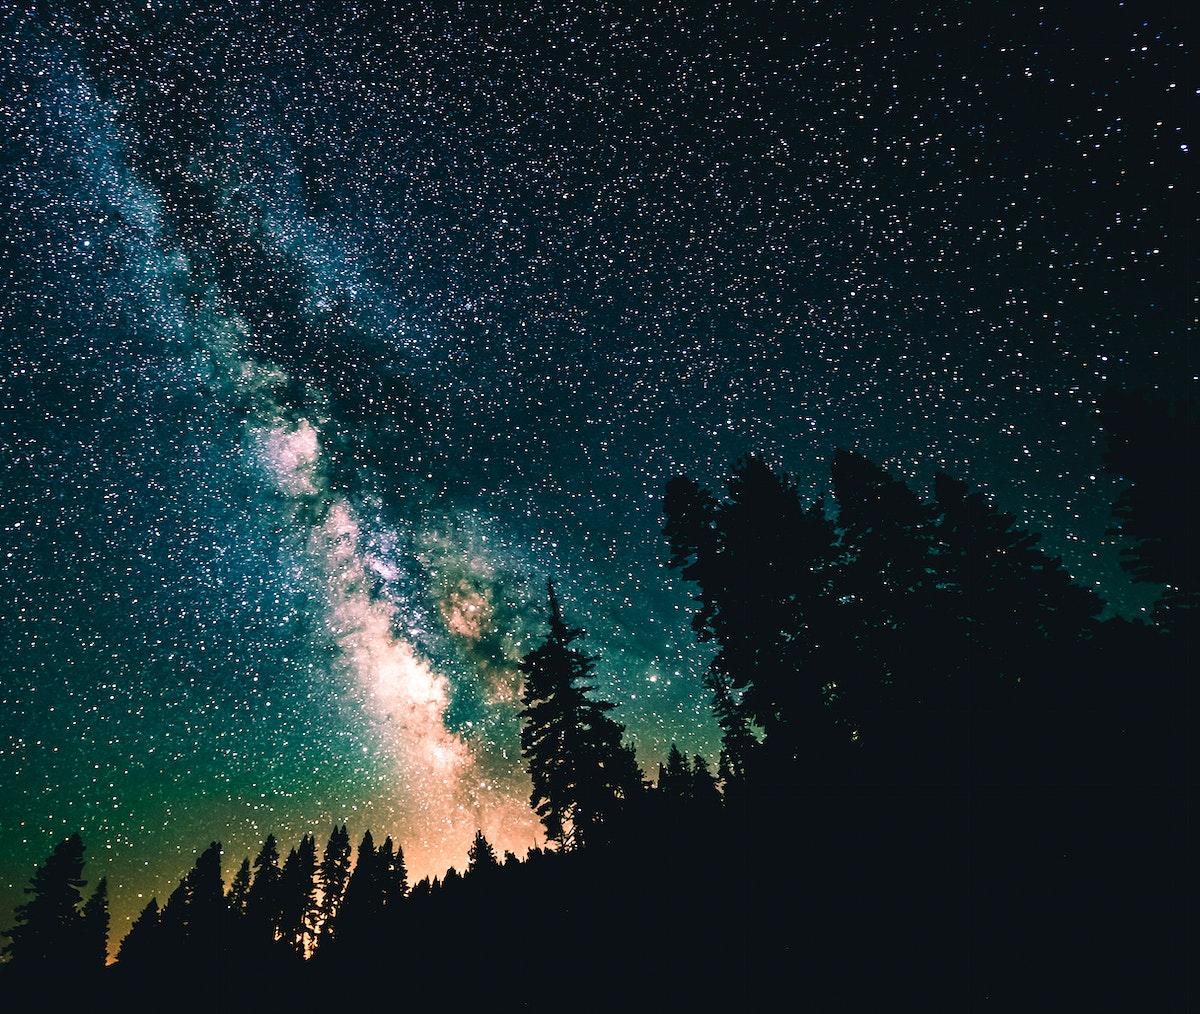 The Milky Way across the night sky in Yosemite Valley California, USA